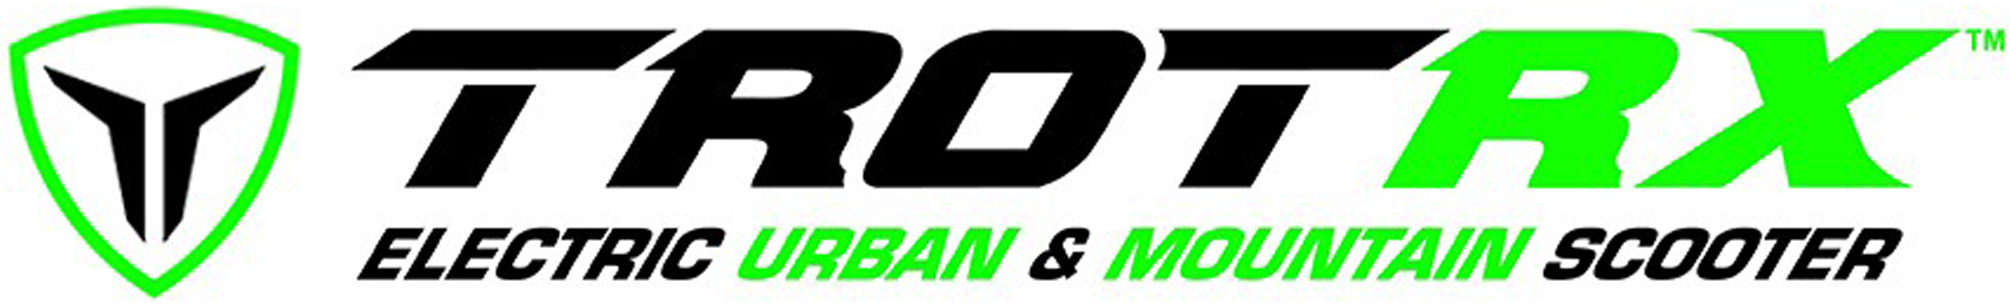 logo TROTRX